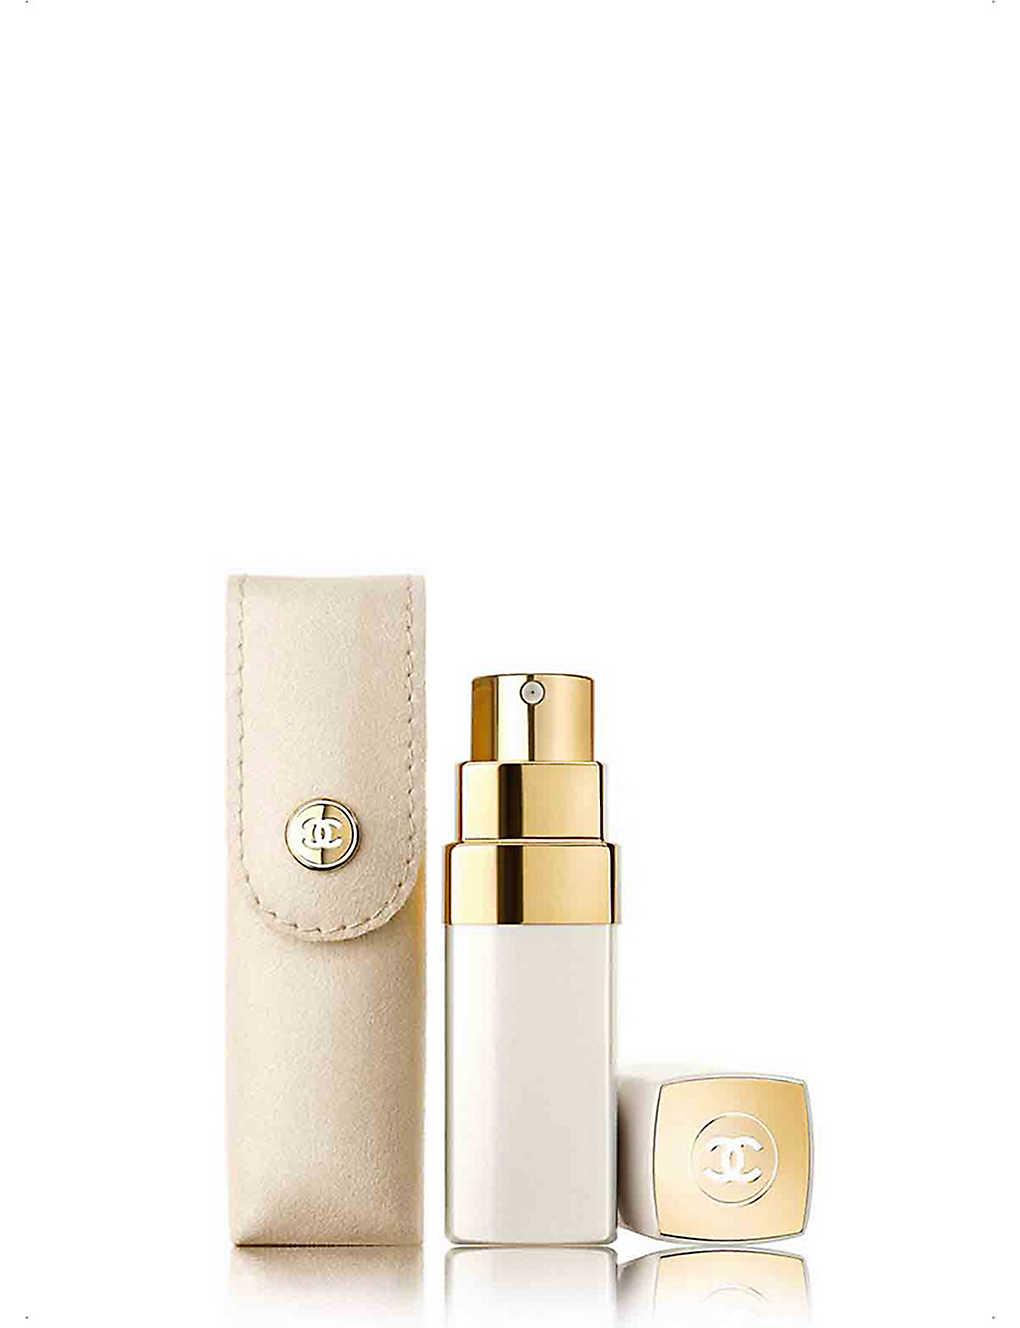 4c6f5b129ea6 CHANEL - COCO MADEMOISELLE Eau De Parfum Purse Spray 3 7.5ml ...